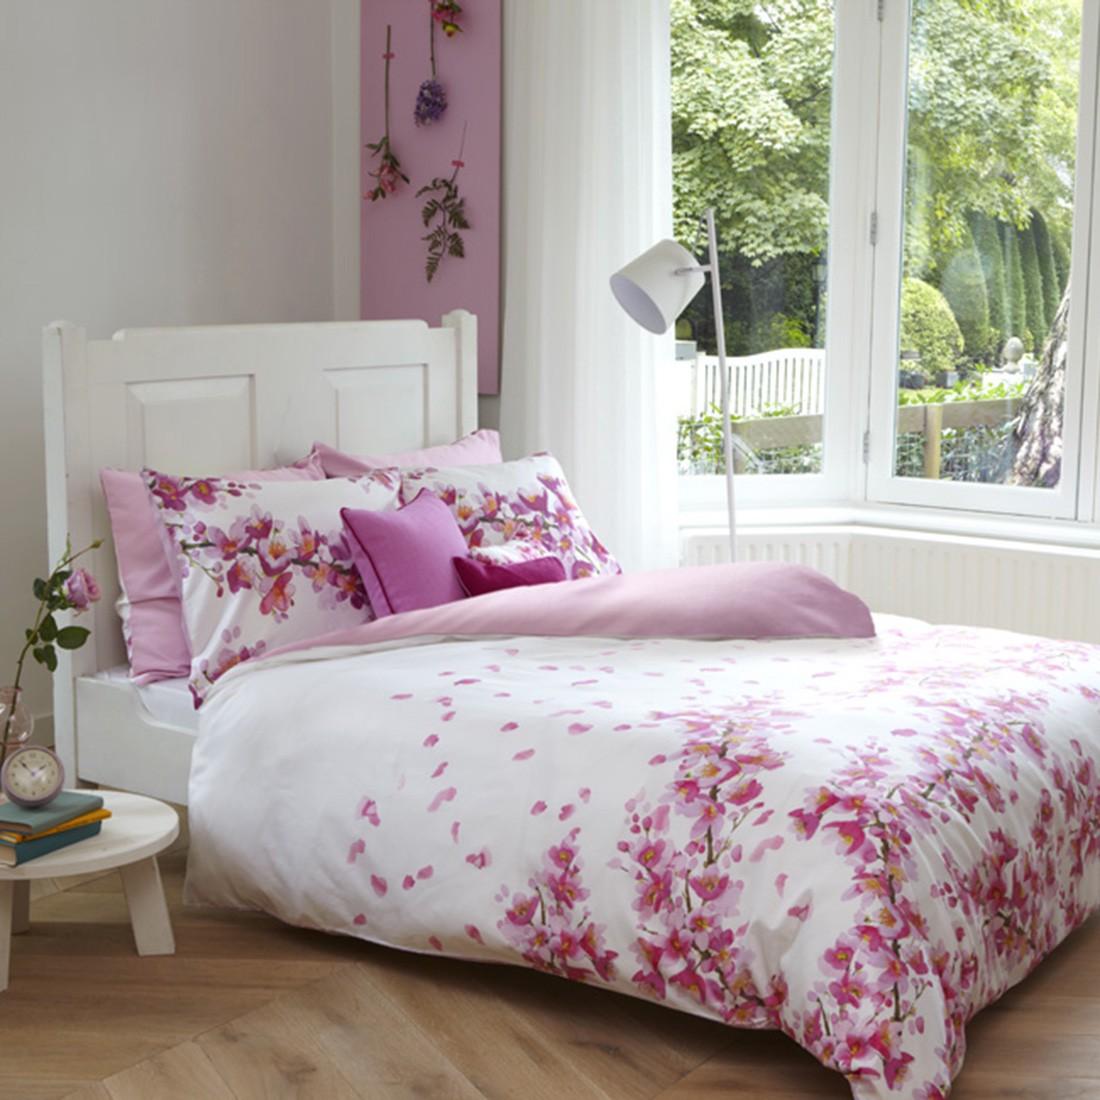 kissenh lle wera mit bommeln rot ecru 45 45 cm quadro schuermanns backstube. Black Bedroom Furniture Sets. Home Design Ideas